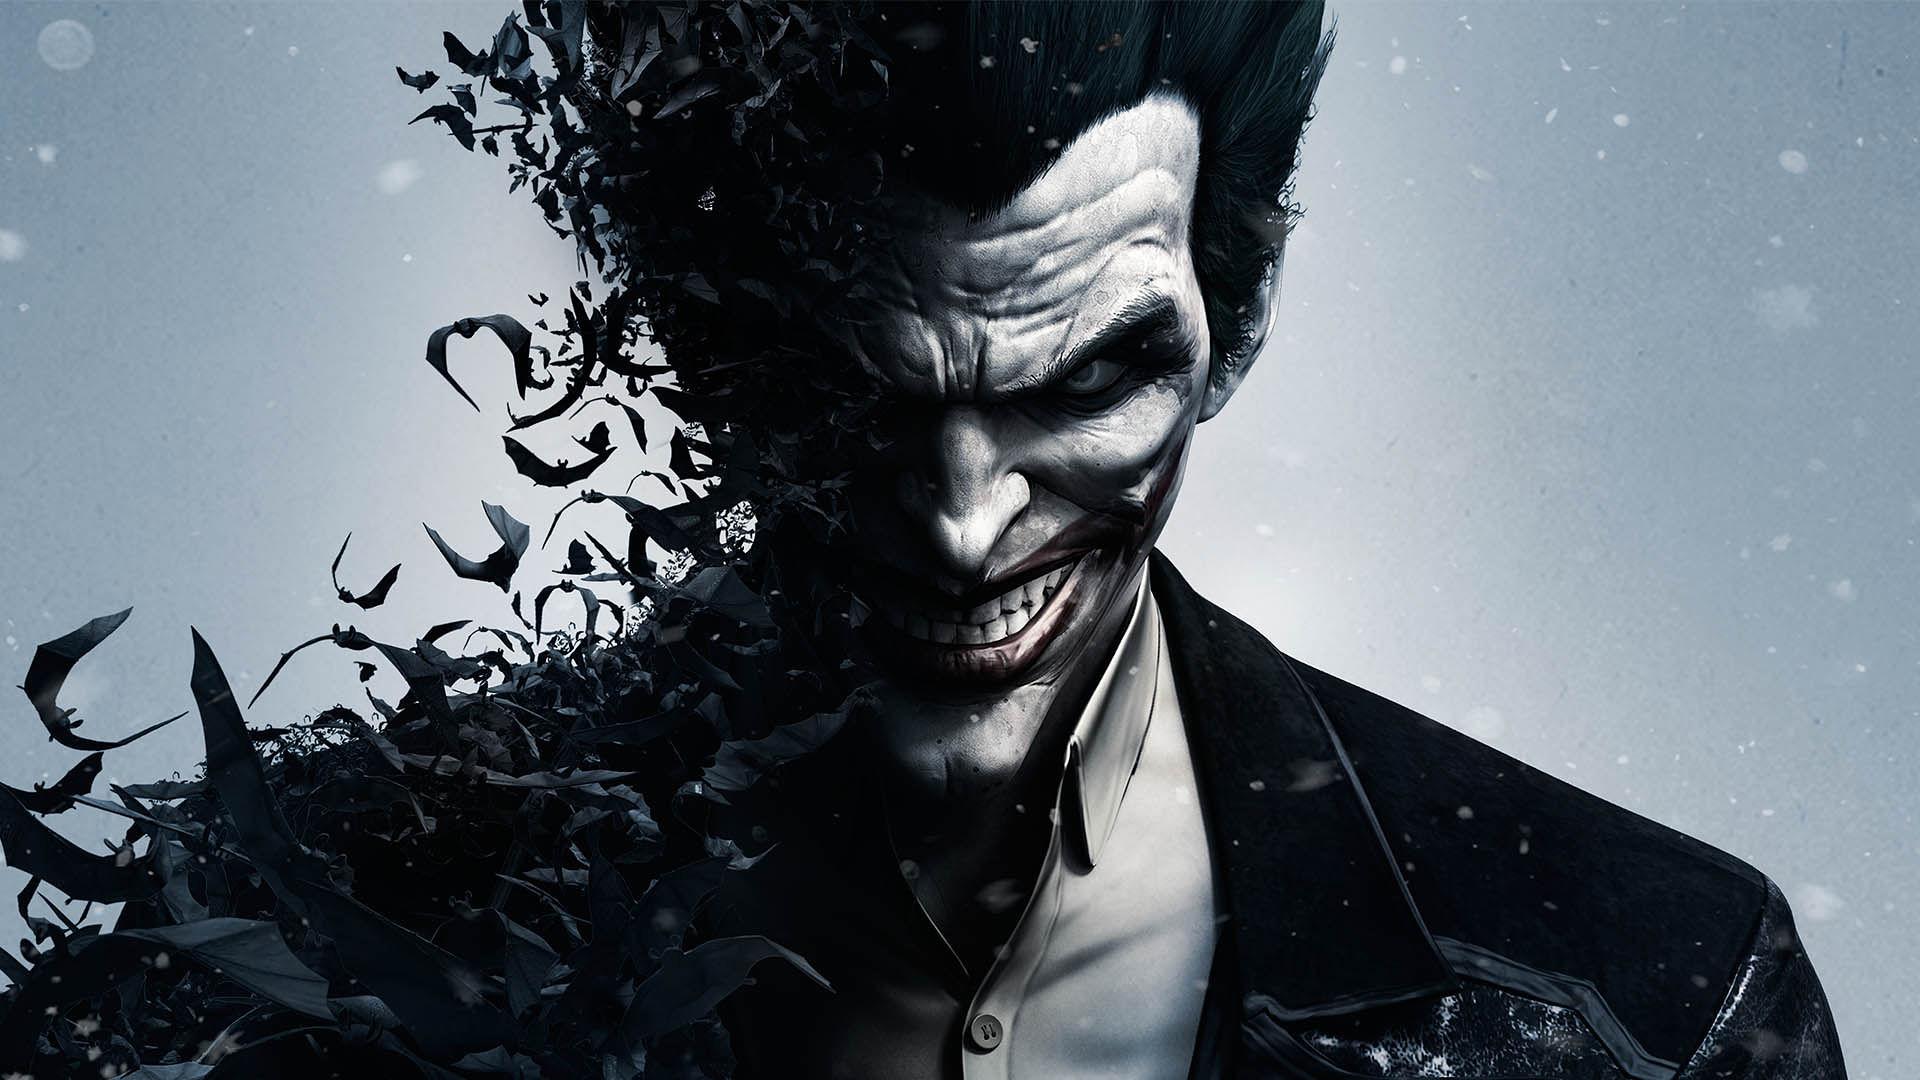 45] Suicide Squad Joker Wallpaper on WallpaperSafari 1920x1080